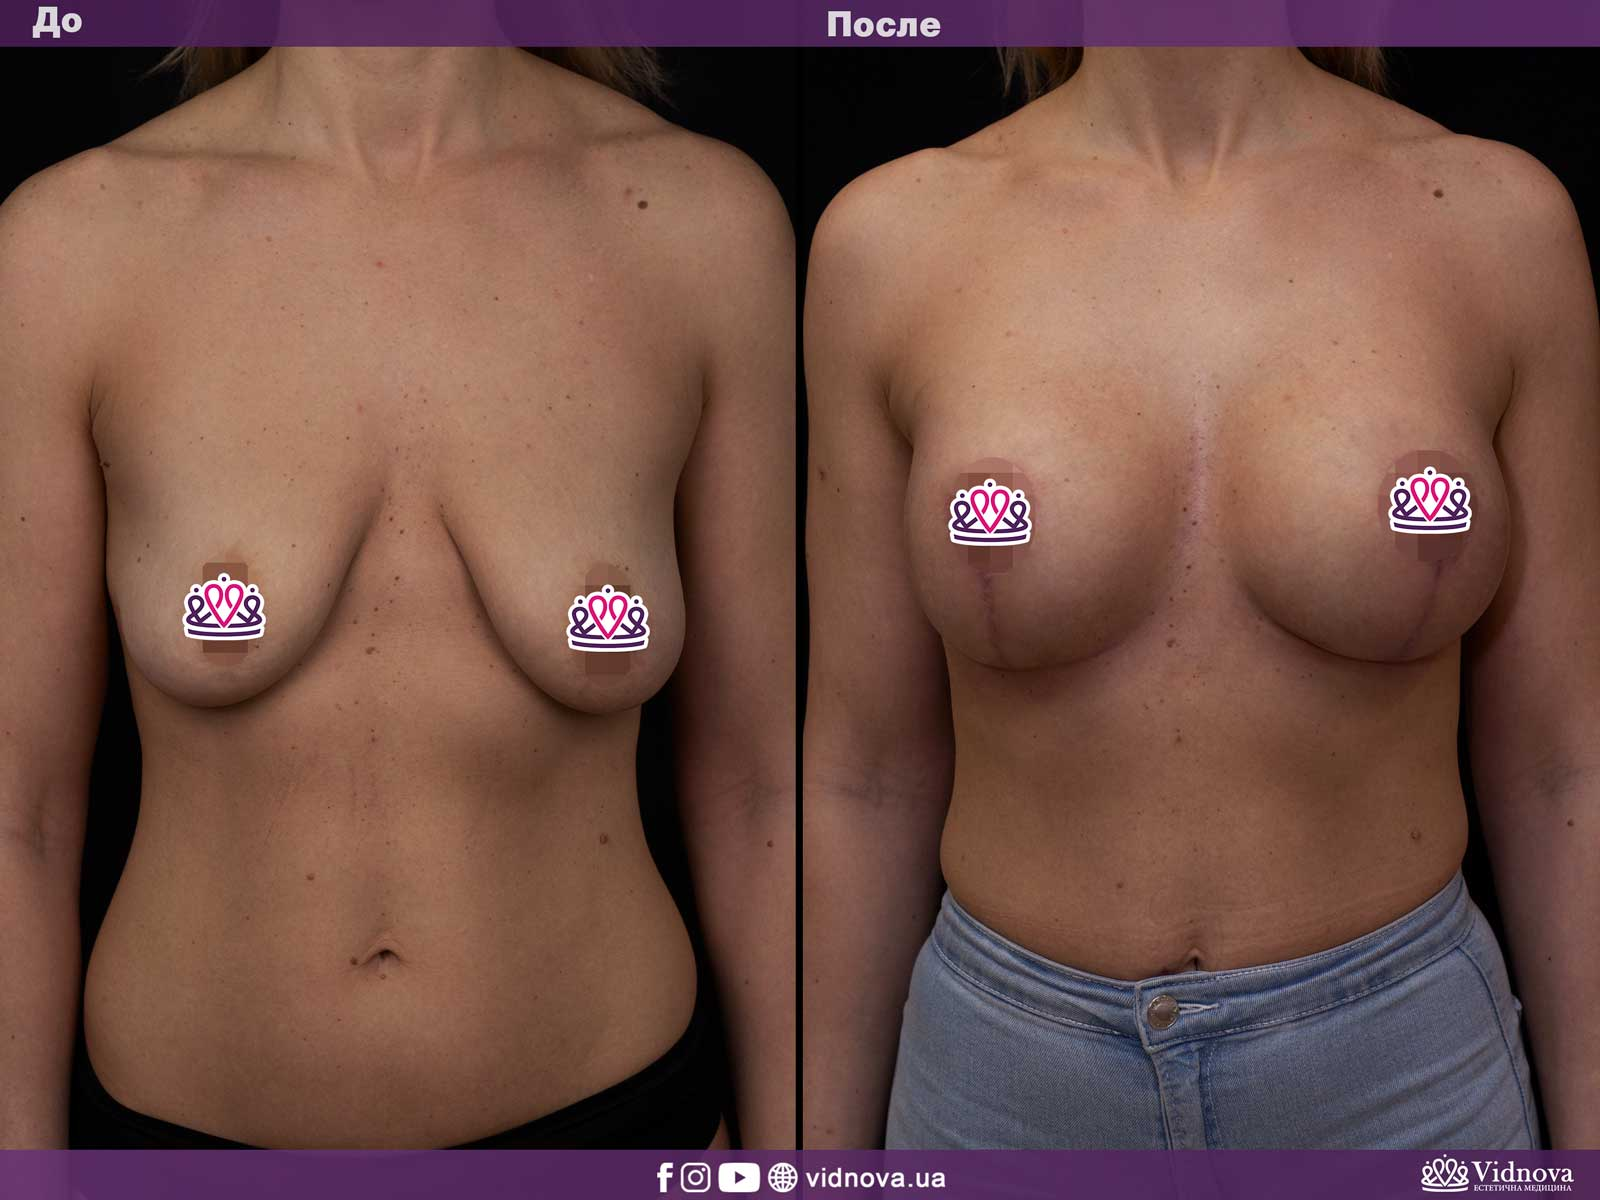 Подтяжка груди: Фото ДО и ПОСЛЕ - Пример №3-1 - Клиника Vidnova